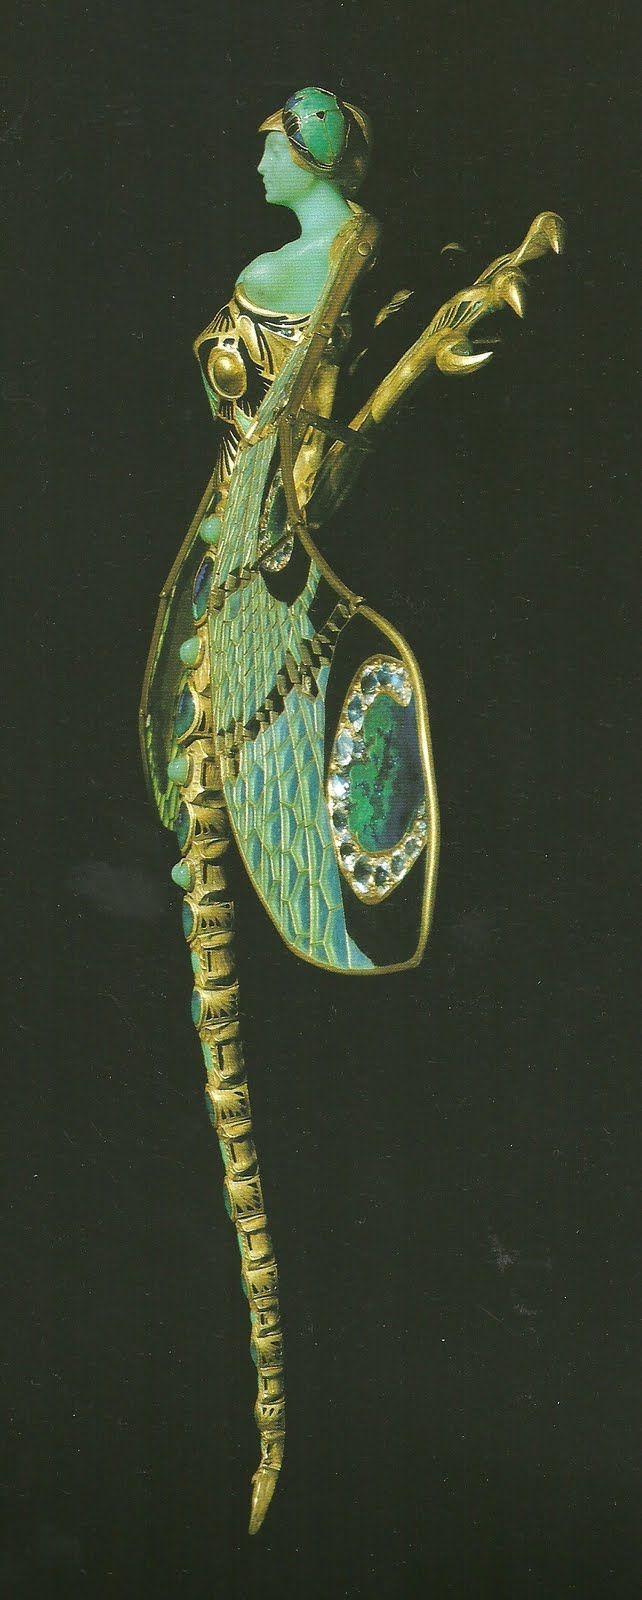 ☆ René Lalique Dragonfly Woman Corsage Ornament Pin {1897–1898} Gold, Enamel, Chrysoprase, Moonstones, and Damonds. ☆